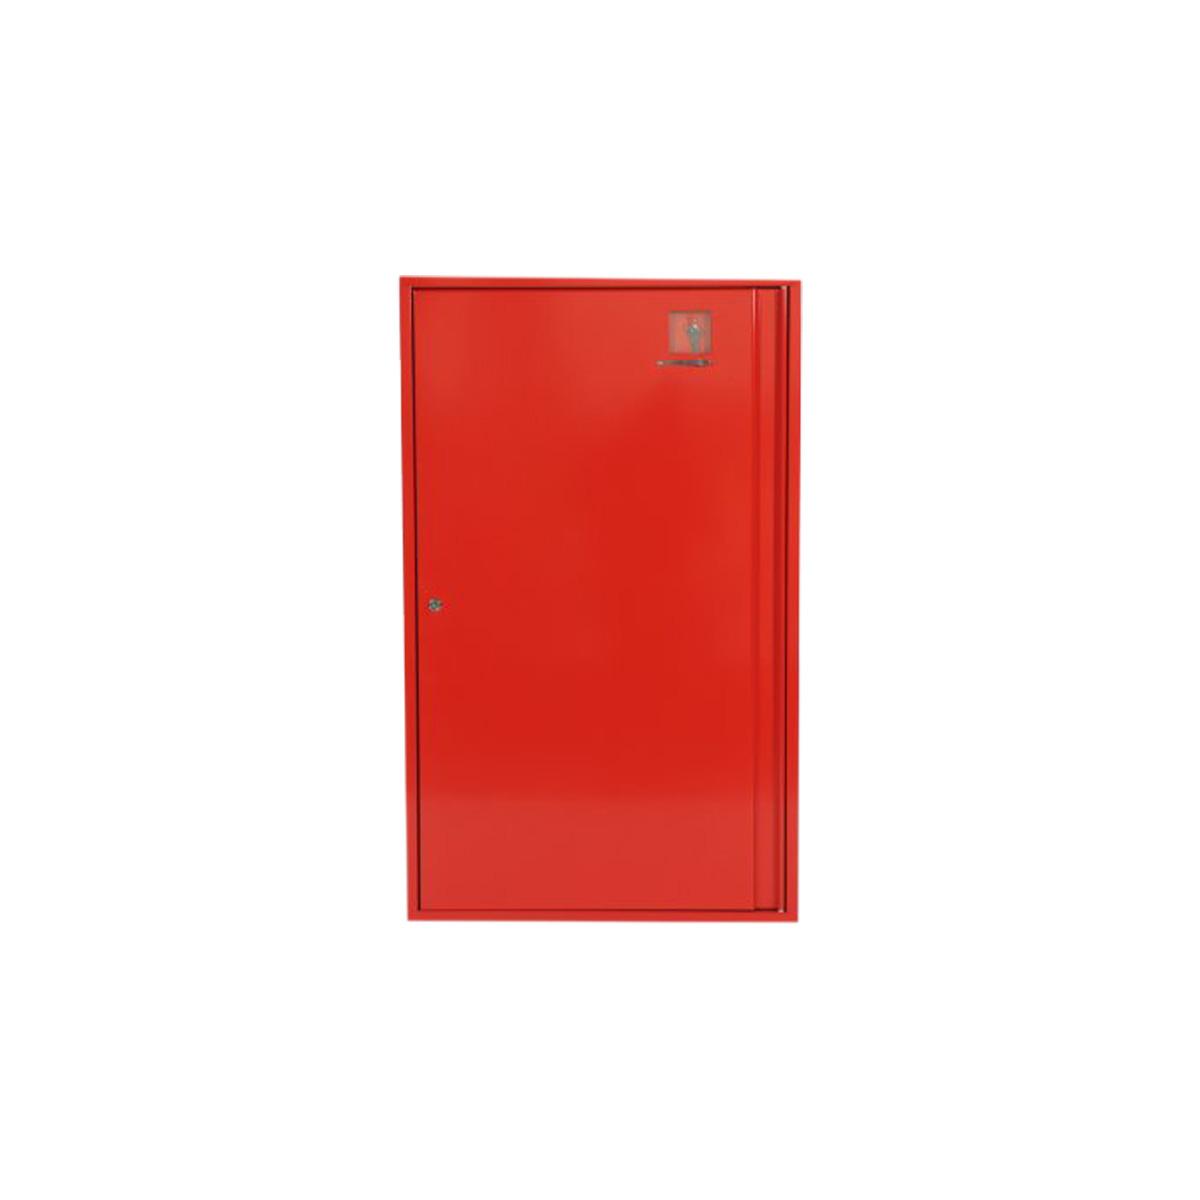 Quick Bhv Kast 112x686x25cm Met Inslagruitje Rood